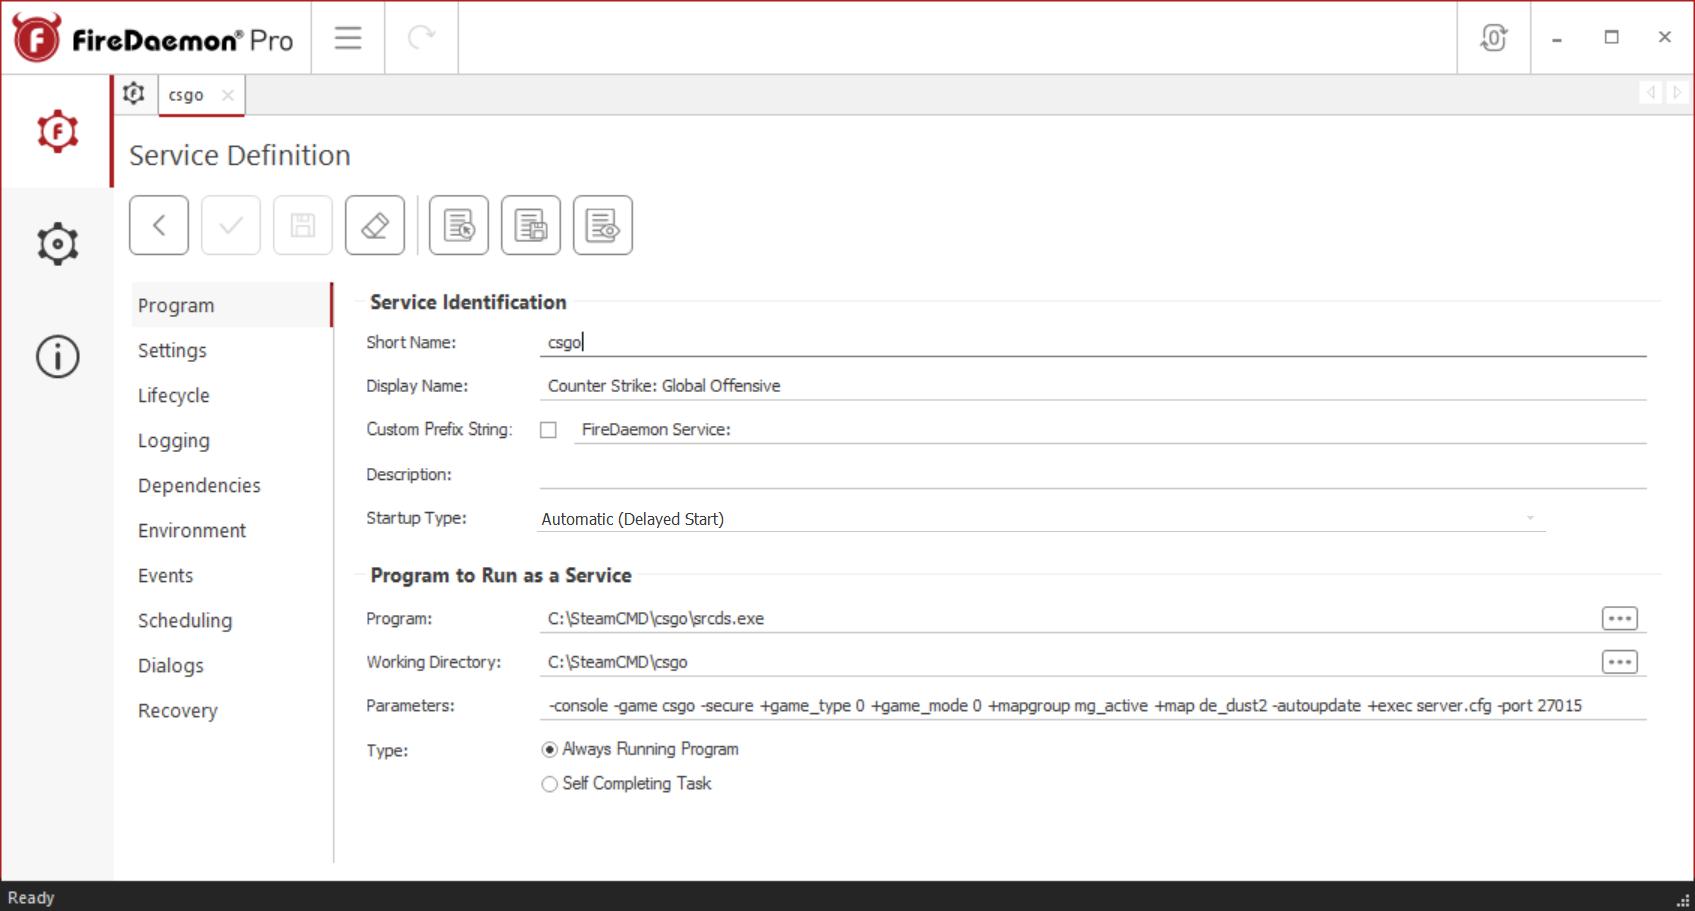 FireDaemon Pro CS:GO Dedicated Server Service Program Tab